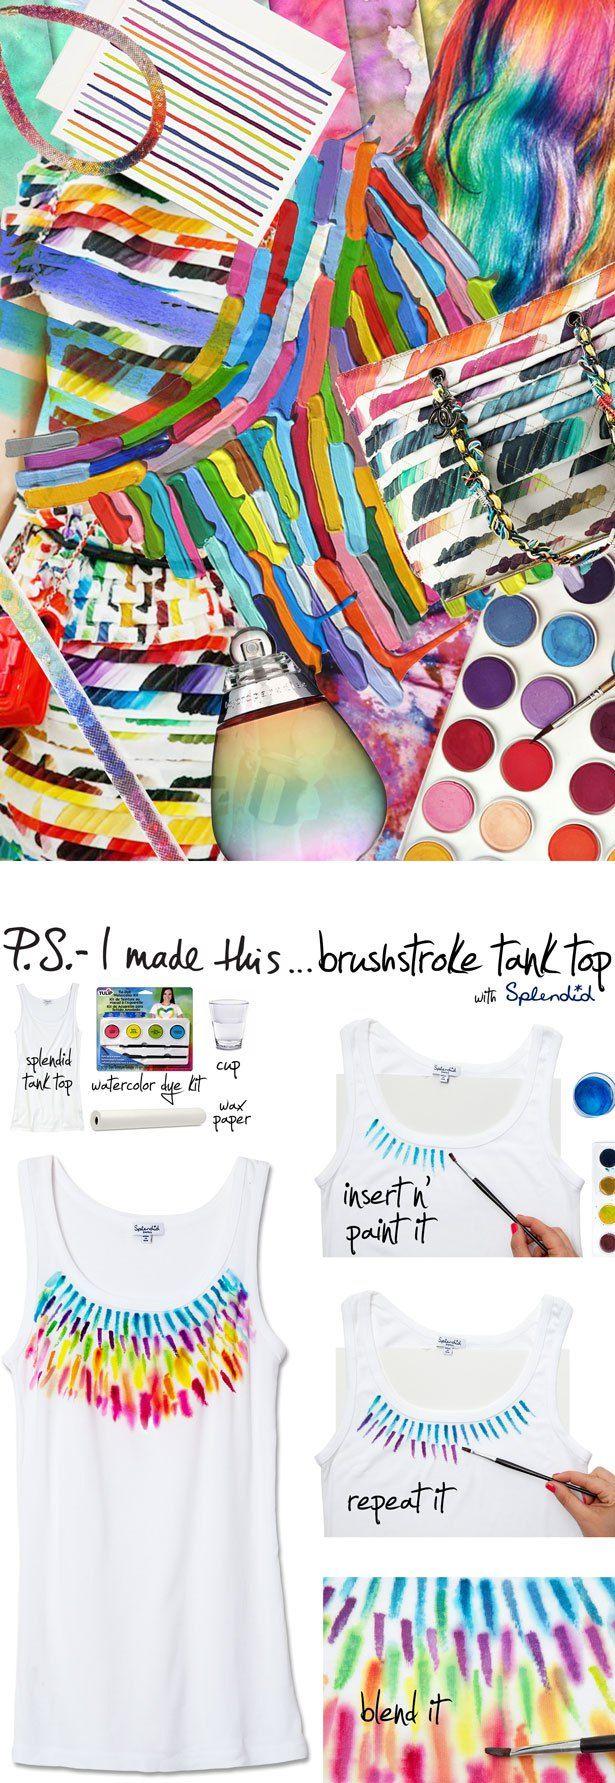 Pintar camisetas con acuarelas - Manualidades Gratis